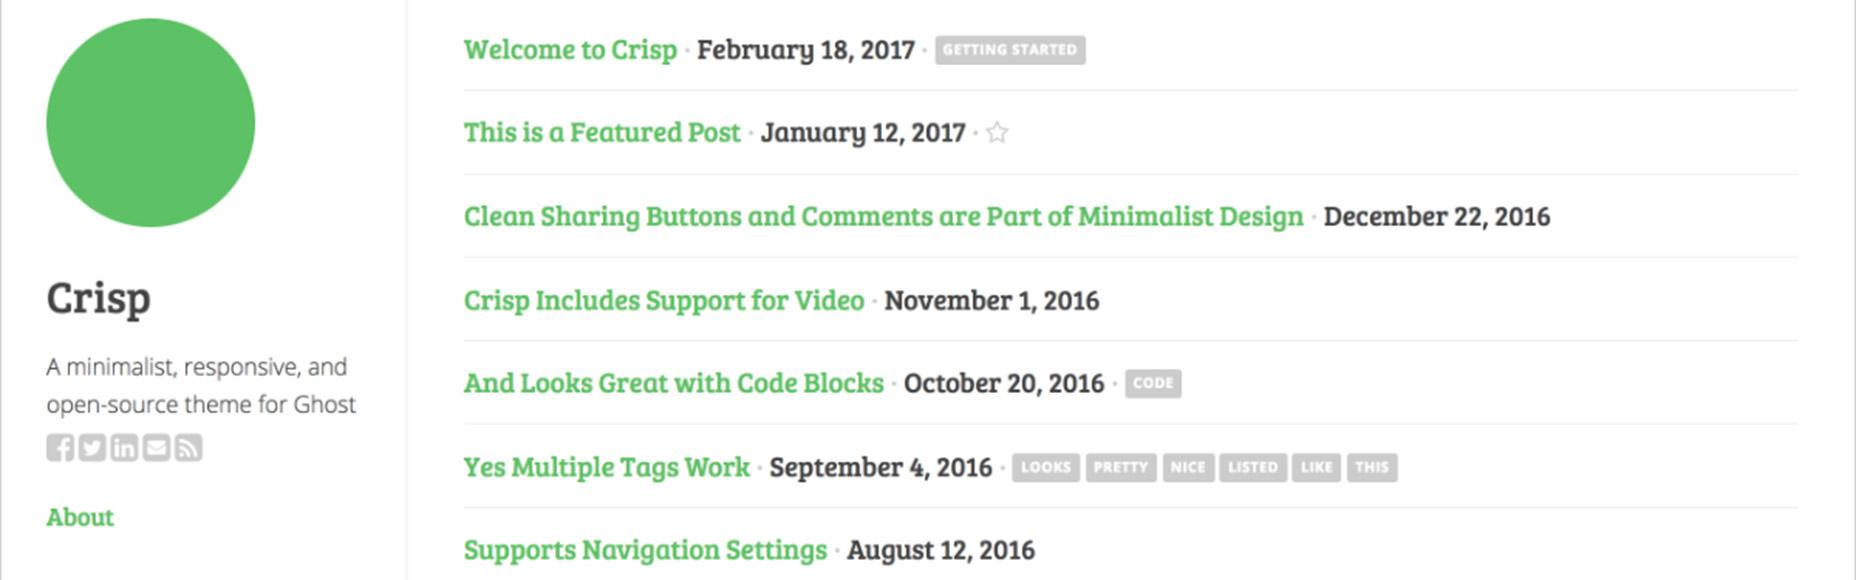 11-crisp-fantasma-blogging-tema